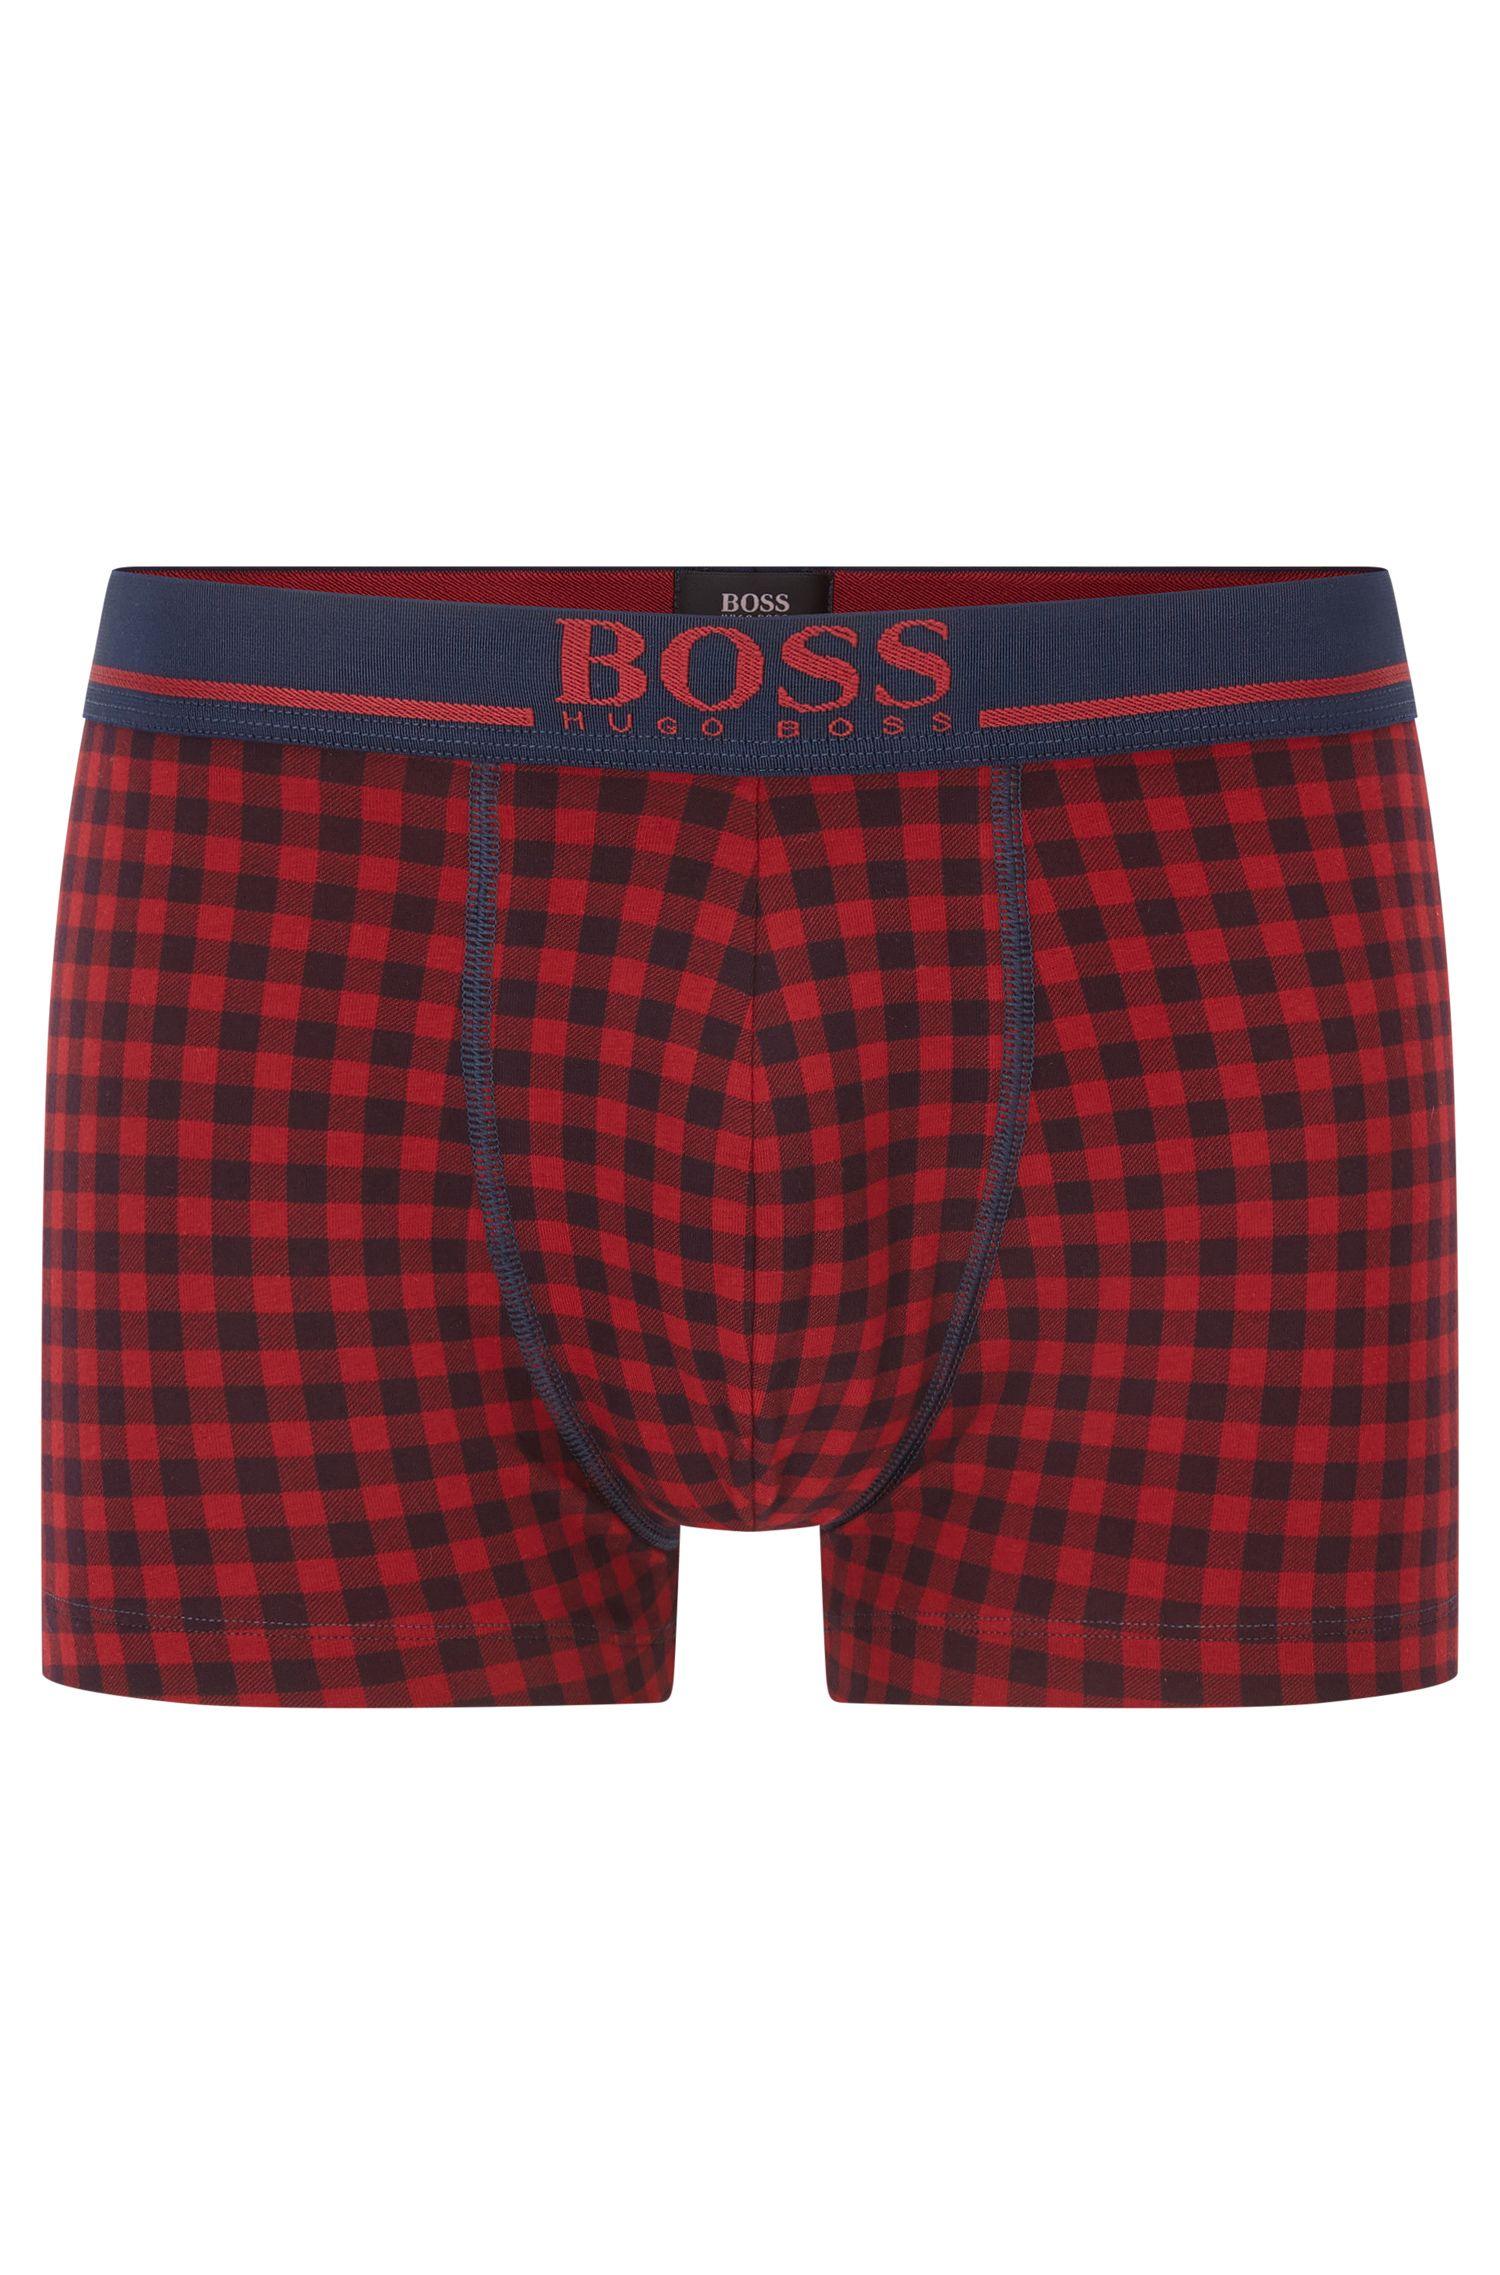 Single-jersey trunks with logo waistband